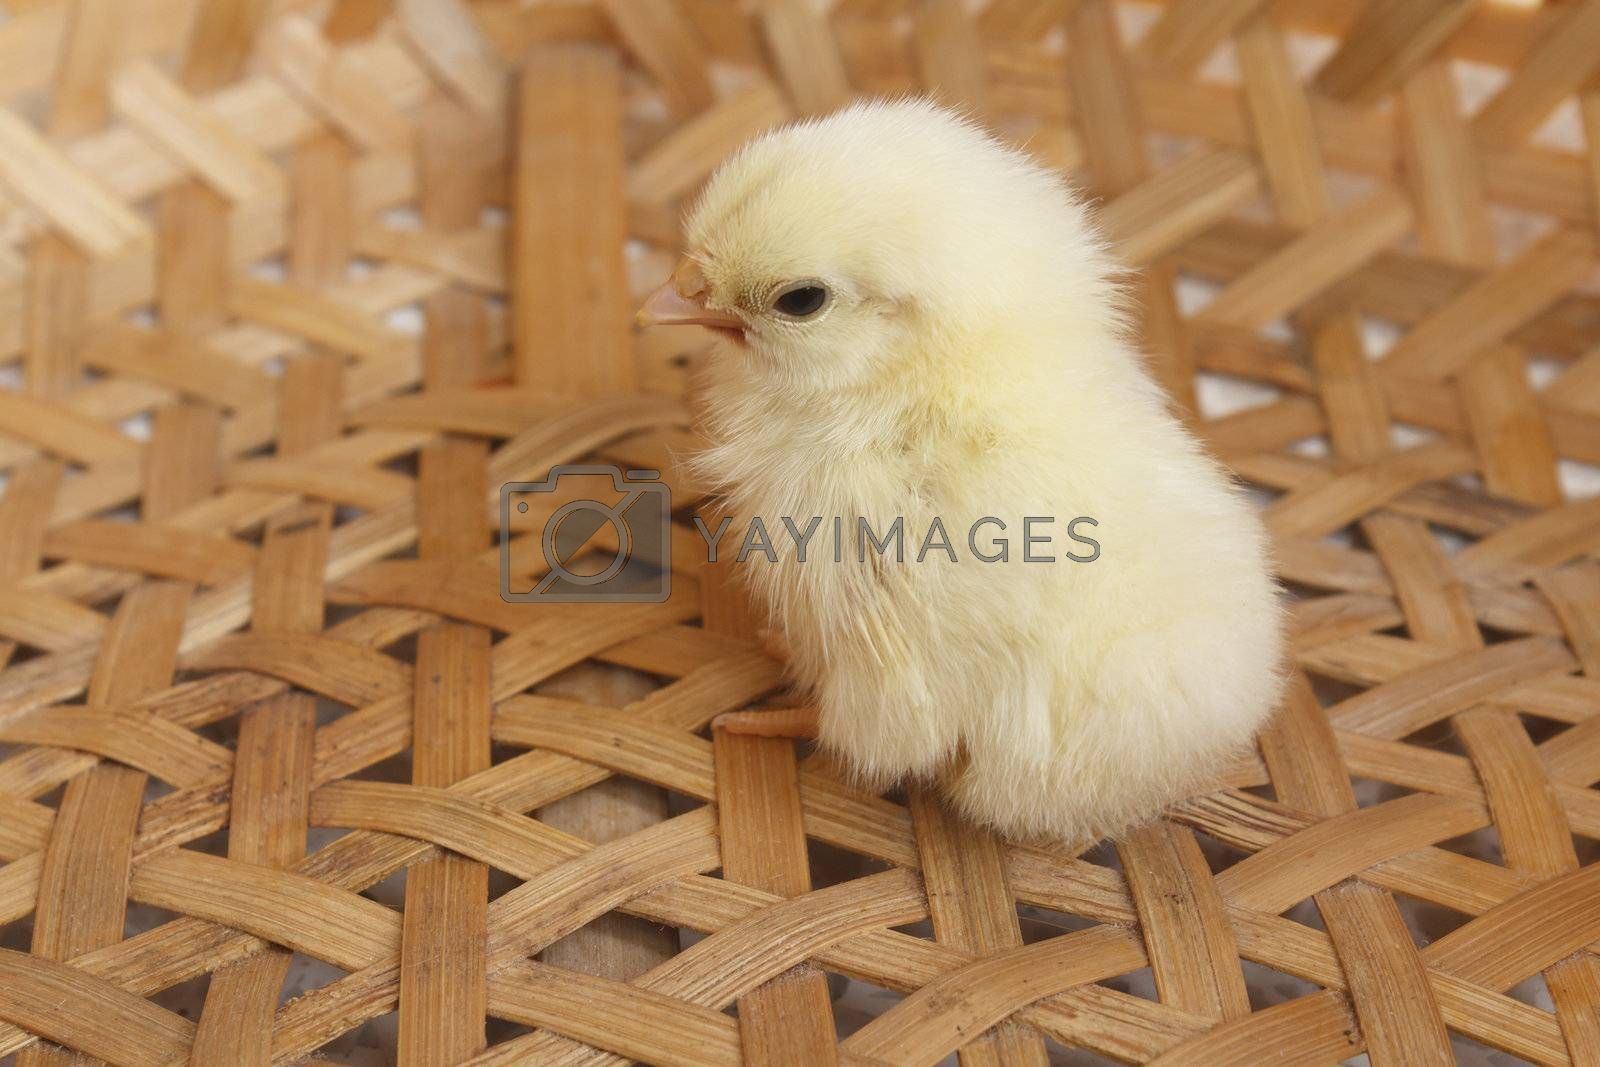 Just newborn bantam chick in bamboo basket